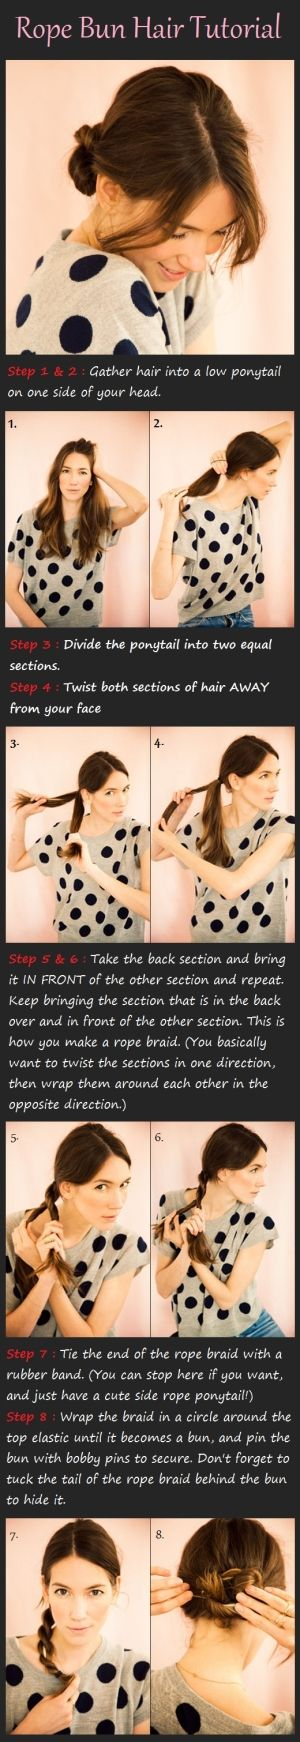 Rope Bun Hair Tutorial | Beauty Tutorials by imad karrari